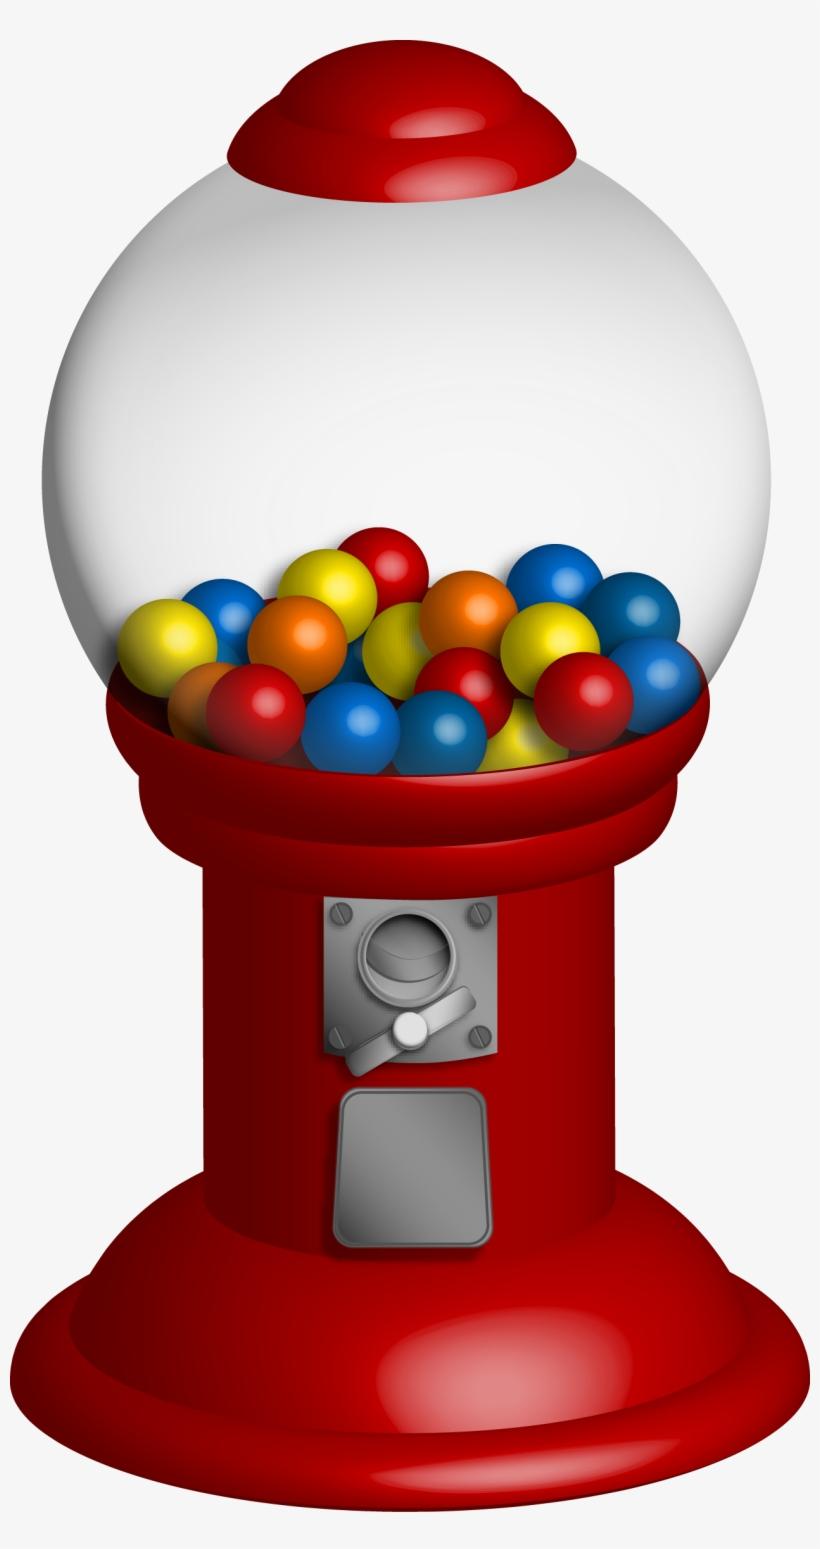 medium resolution of gumball machine clipart bubble gum machine png